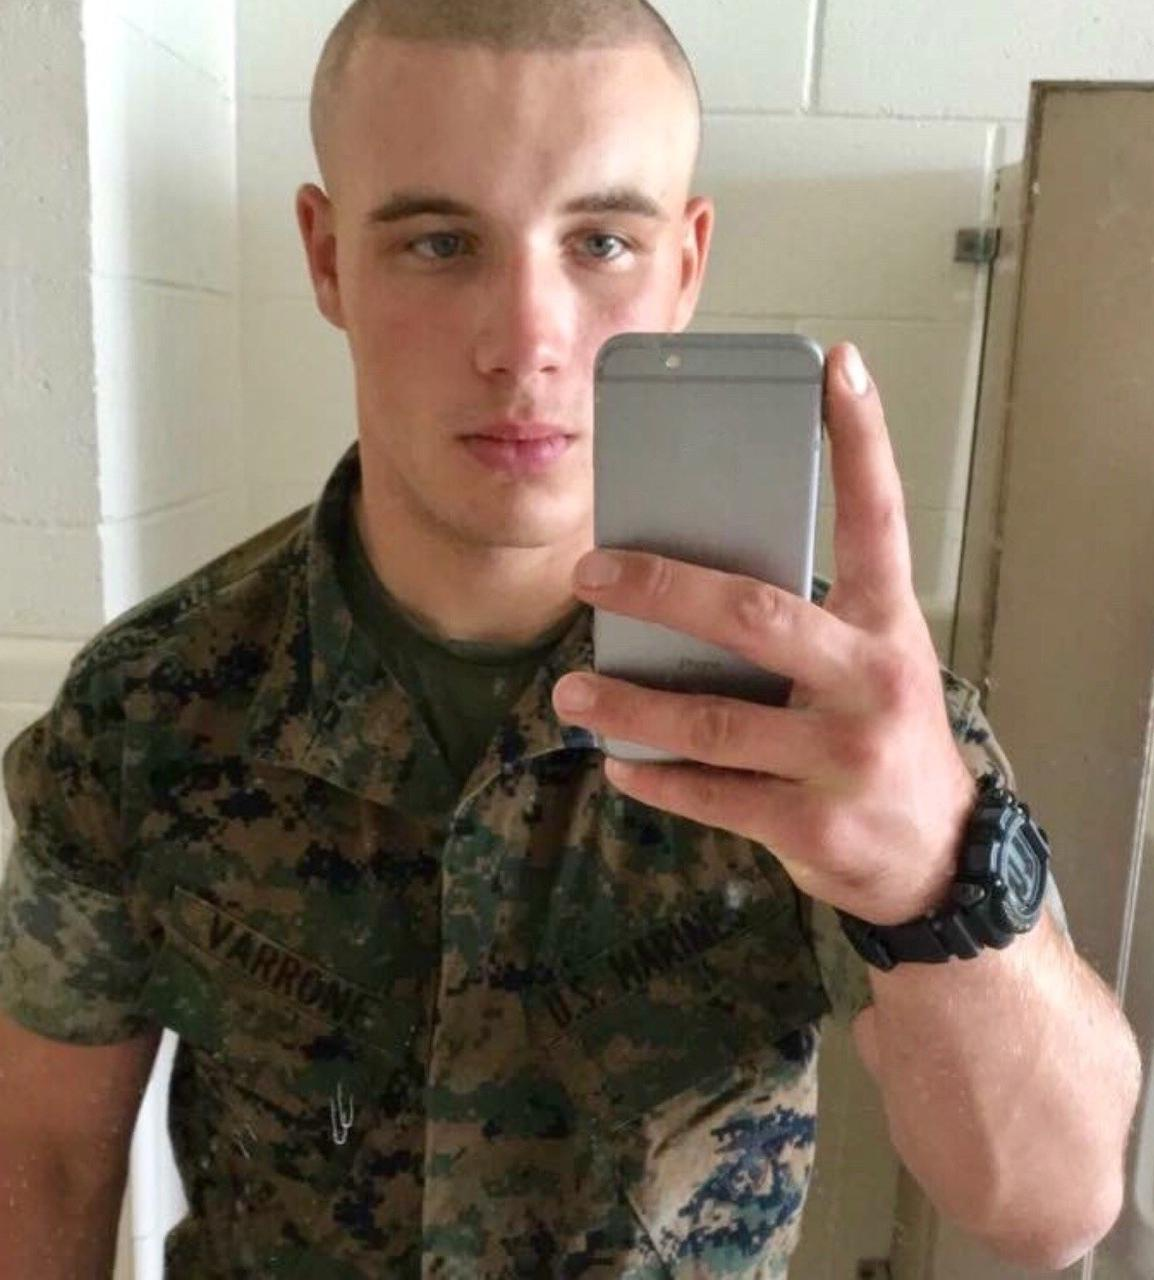 bald-handsome-male-us-marine-uniform-young-soldier-selfie